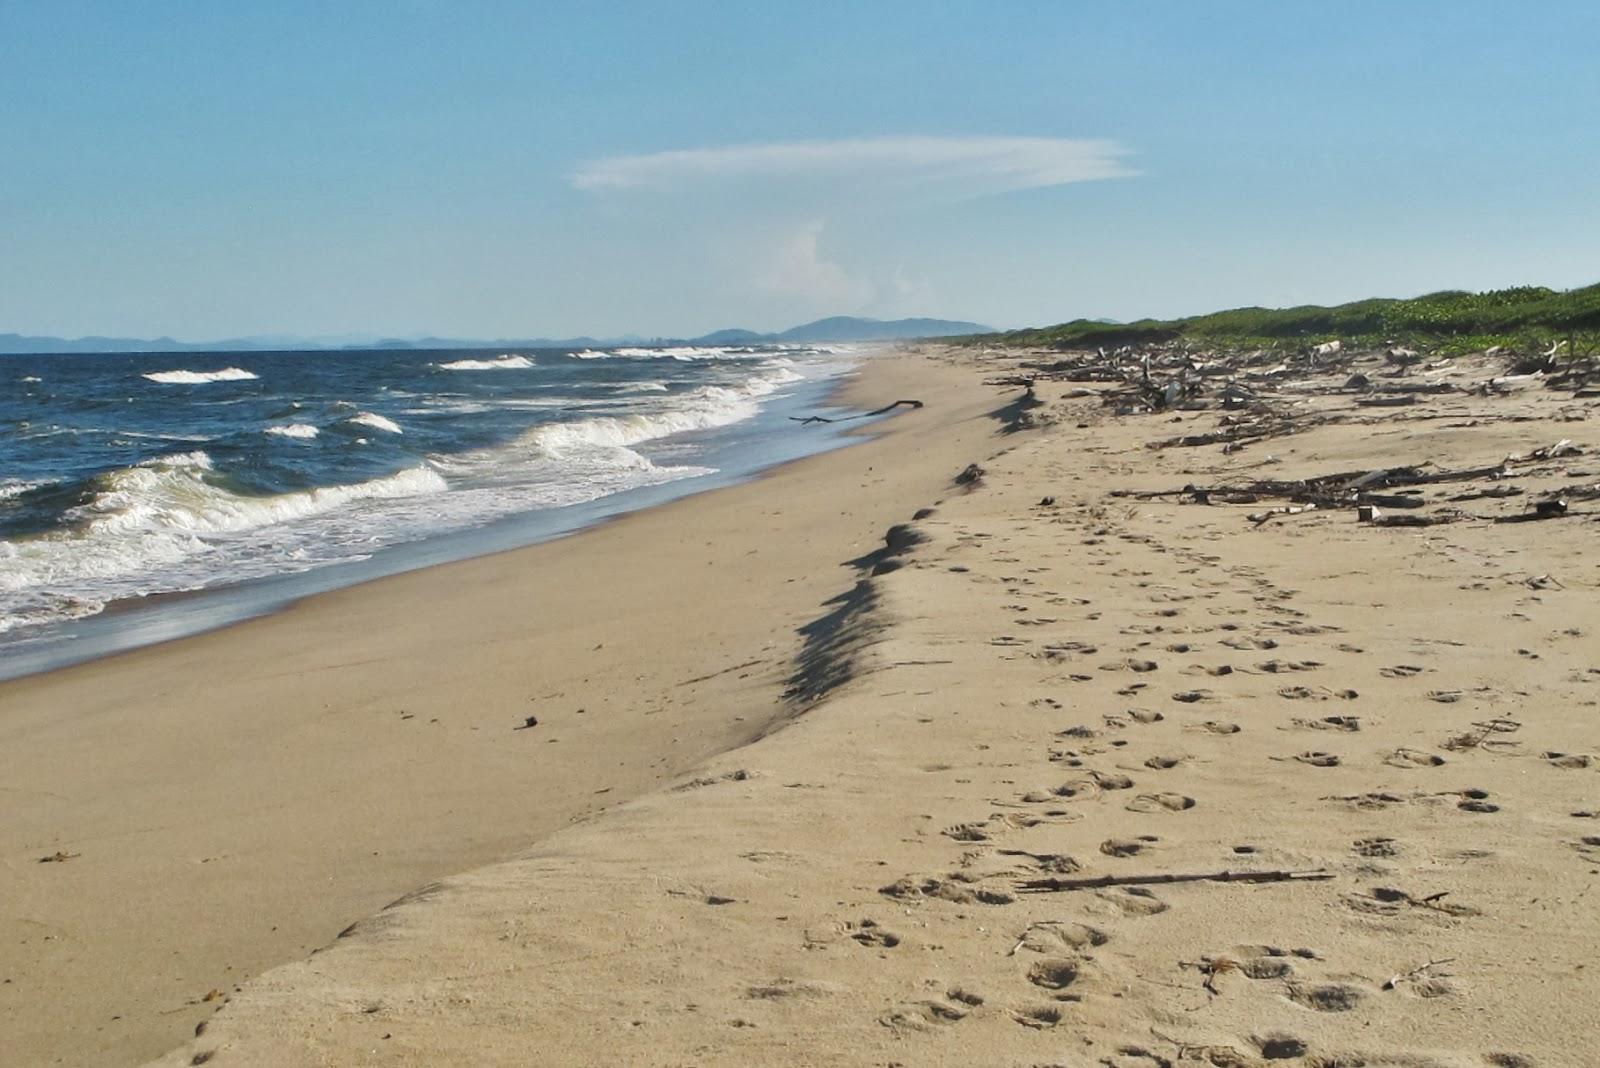 Praia paralela ao Rio Itapocu, entre Barra Velha e Araquari, no litoral catarinense.